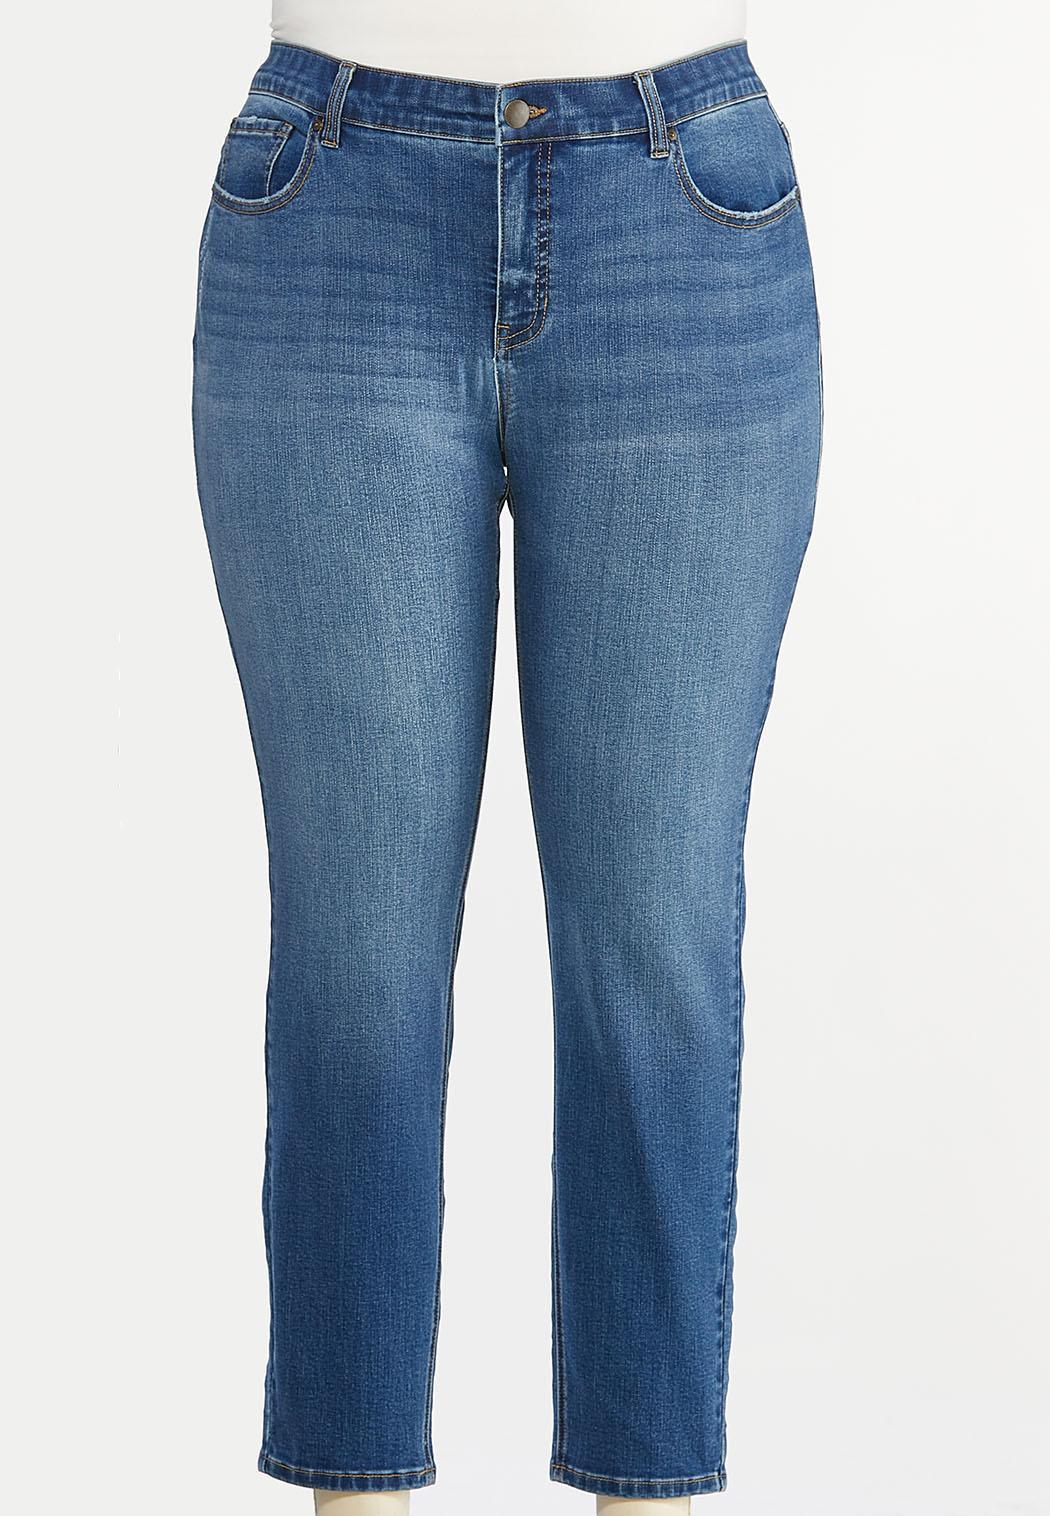 Plus Size Uplifting Skinny Jeans